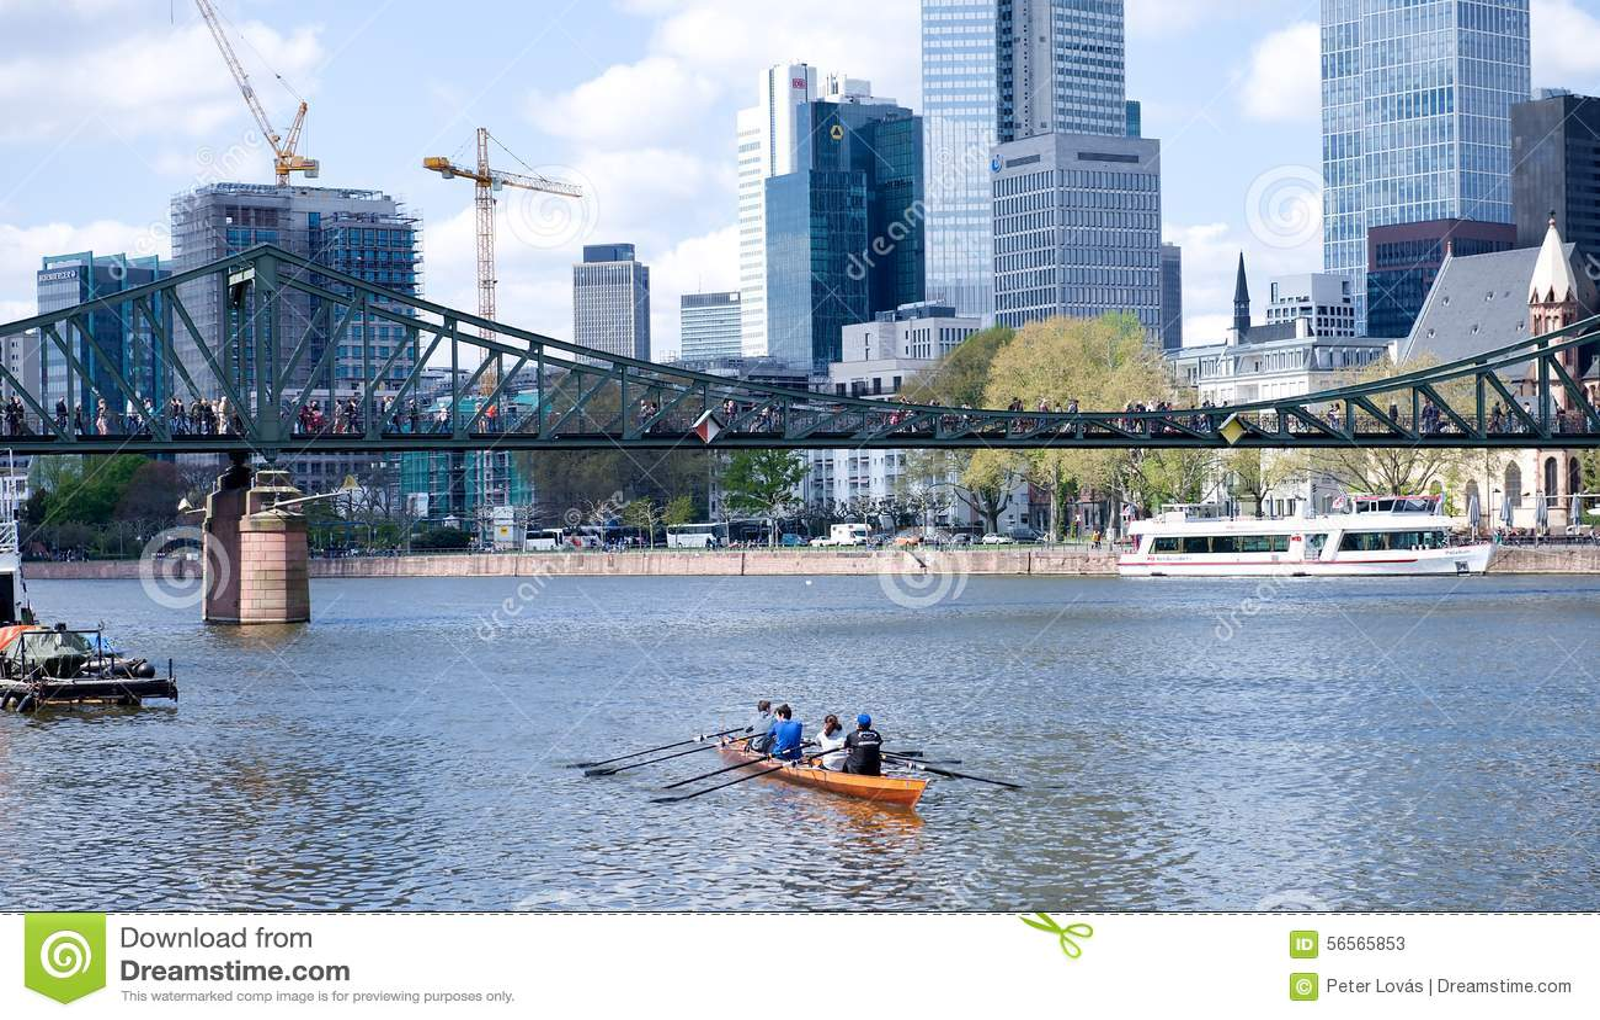 Download Φρανκφούρτη Αμ Μάιν - βάρκα κωπηλασίας στον ποταμό Εκδοτική Στοκ Εικόνες - εικόνα από floating, εικόνα: 56565853